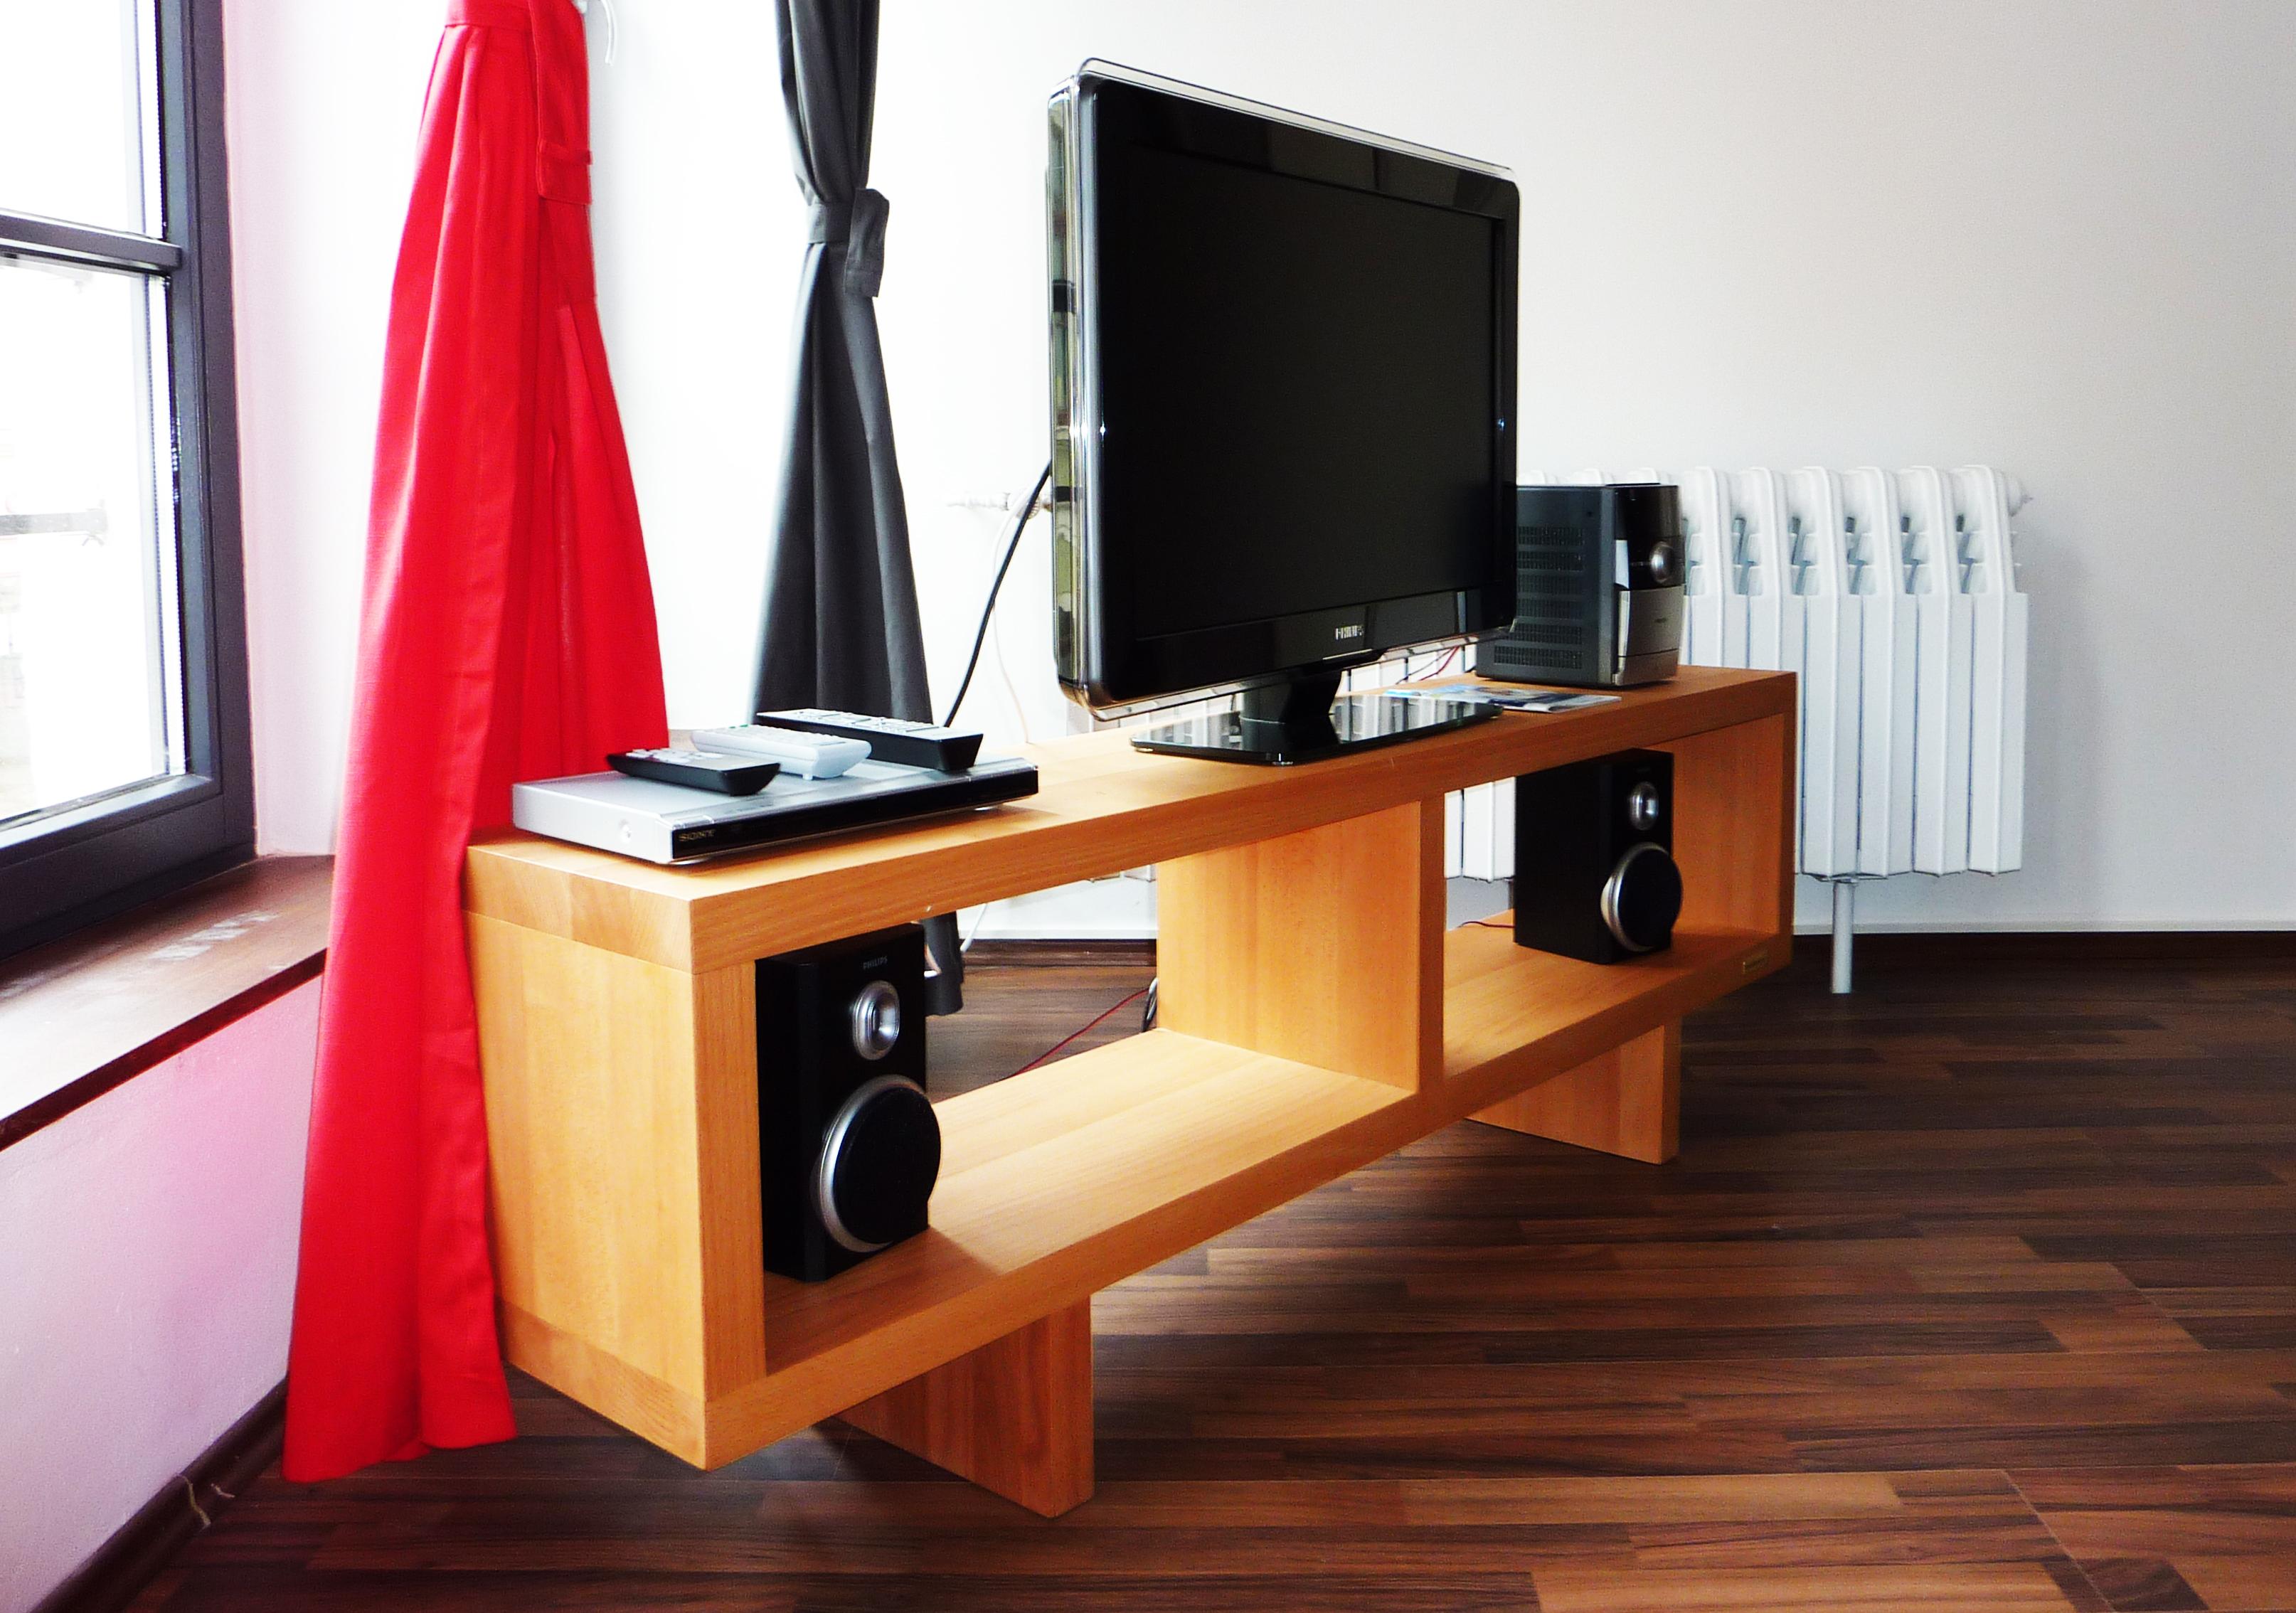 Gunstige Designer Sideboard Mobel Kommode Massivholz Modern Gunstig